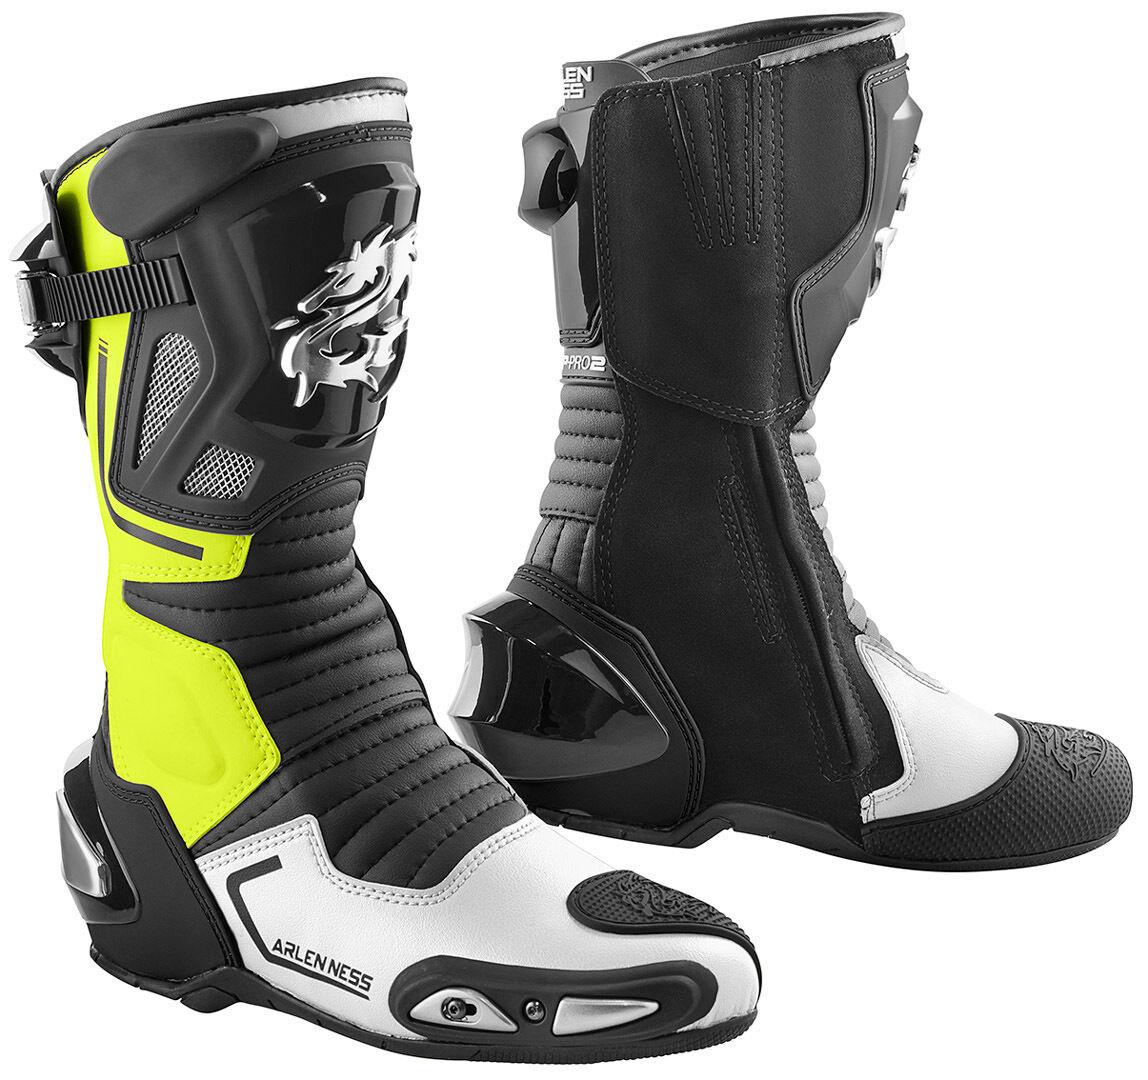 Arlen Ness Sugello Bottes de moto Noir Jaune taille : 42